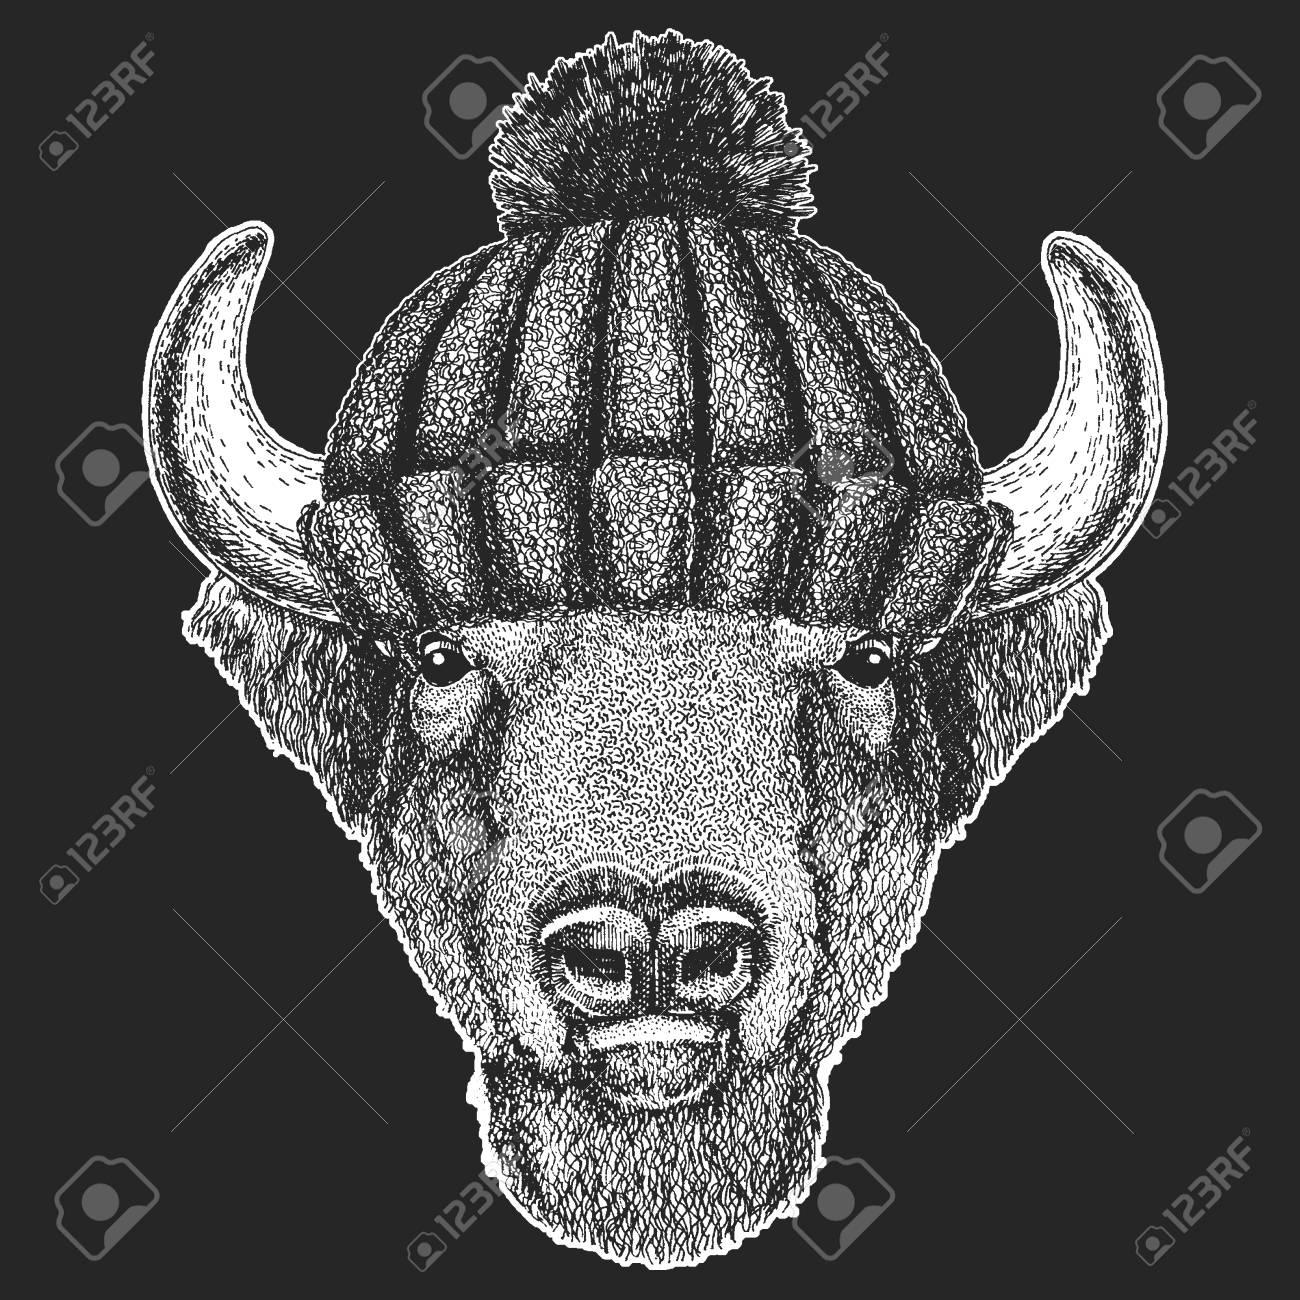 35316cb79 Cute animal wearing knitted winter hat Buffalo, bison,ox, bull Hand drawn  image